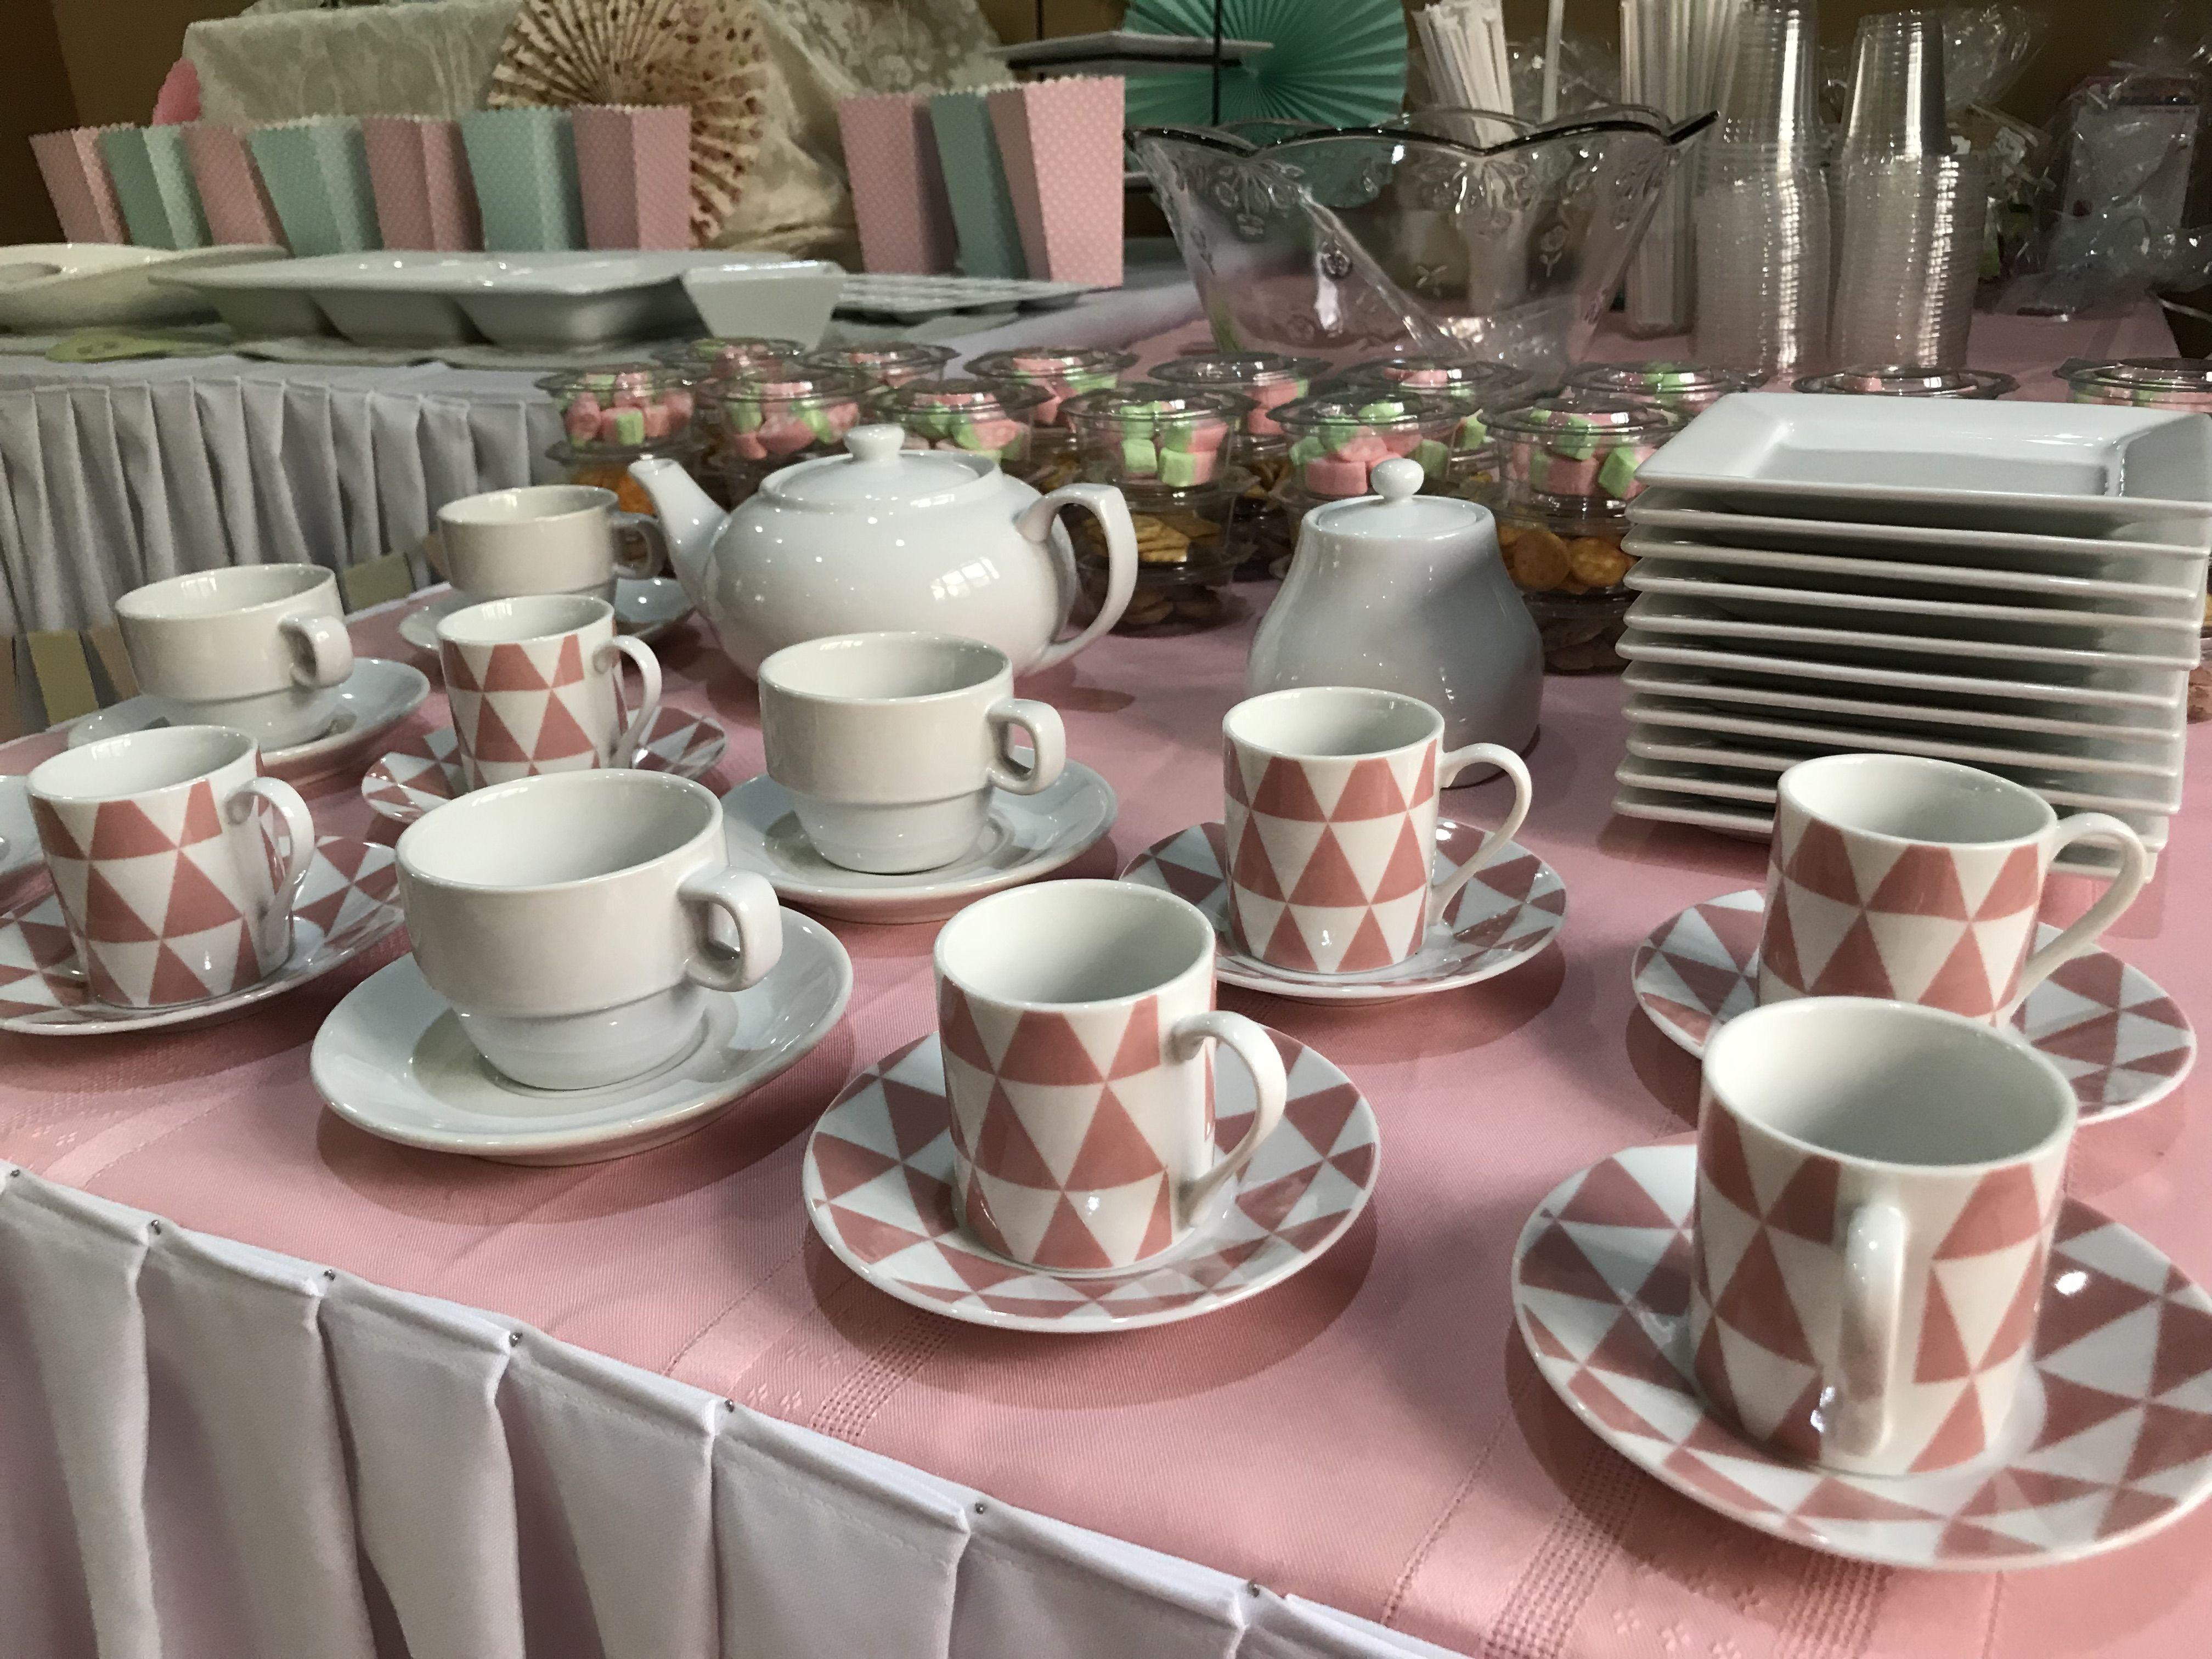 Custom Design For Tea Party Themed Birthday Party